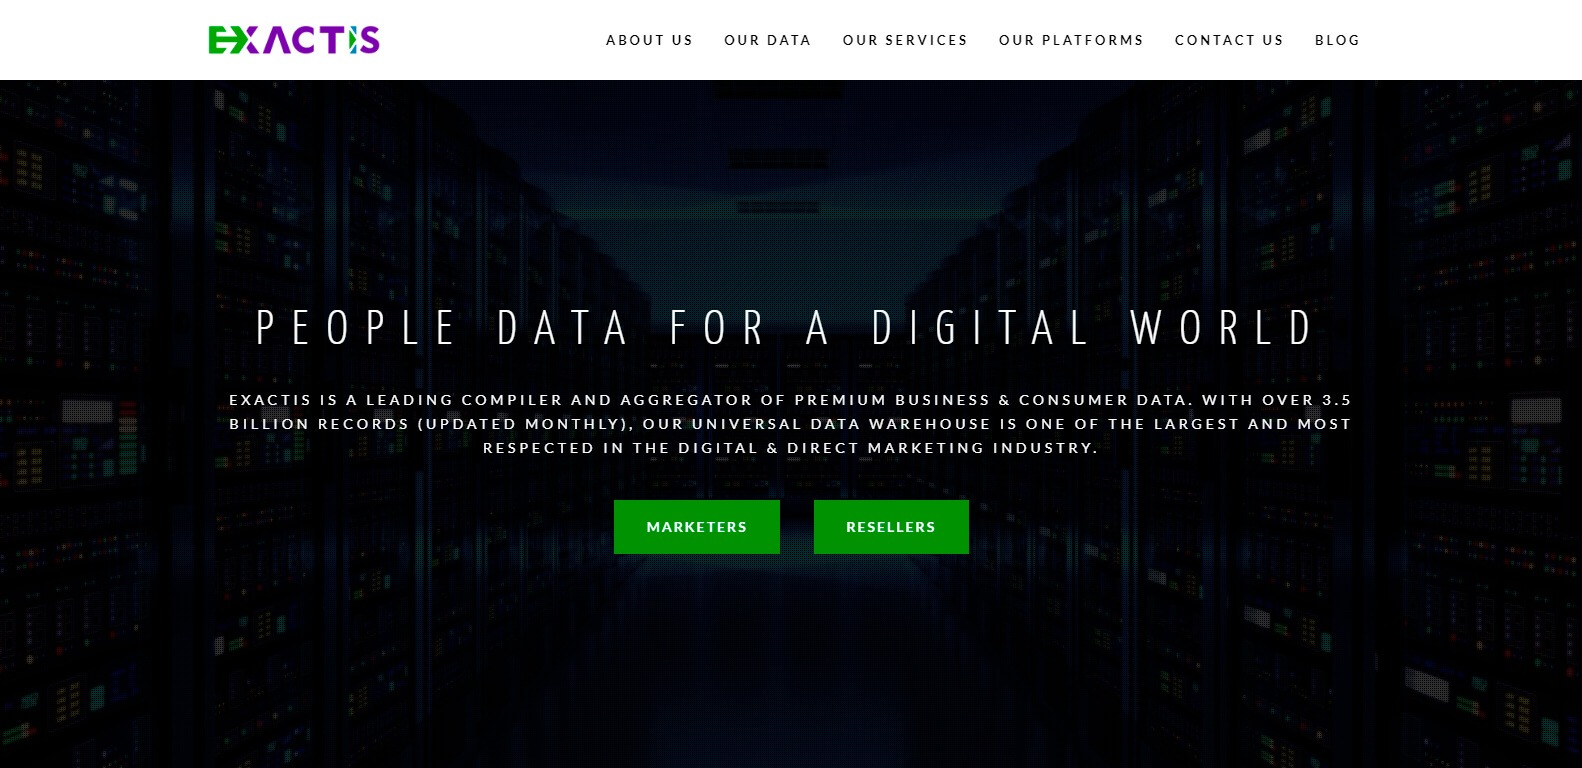 exactis data breach